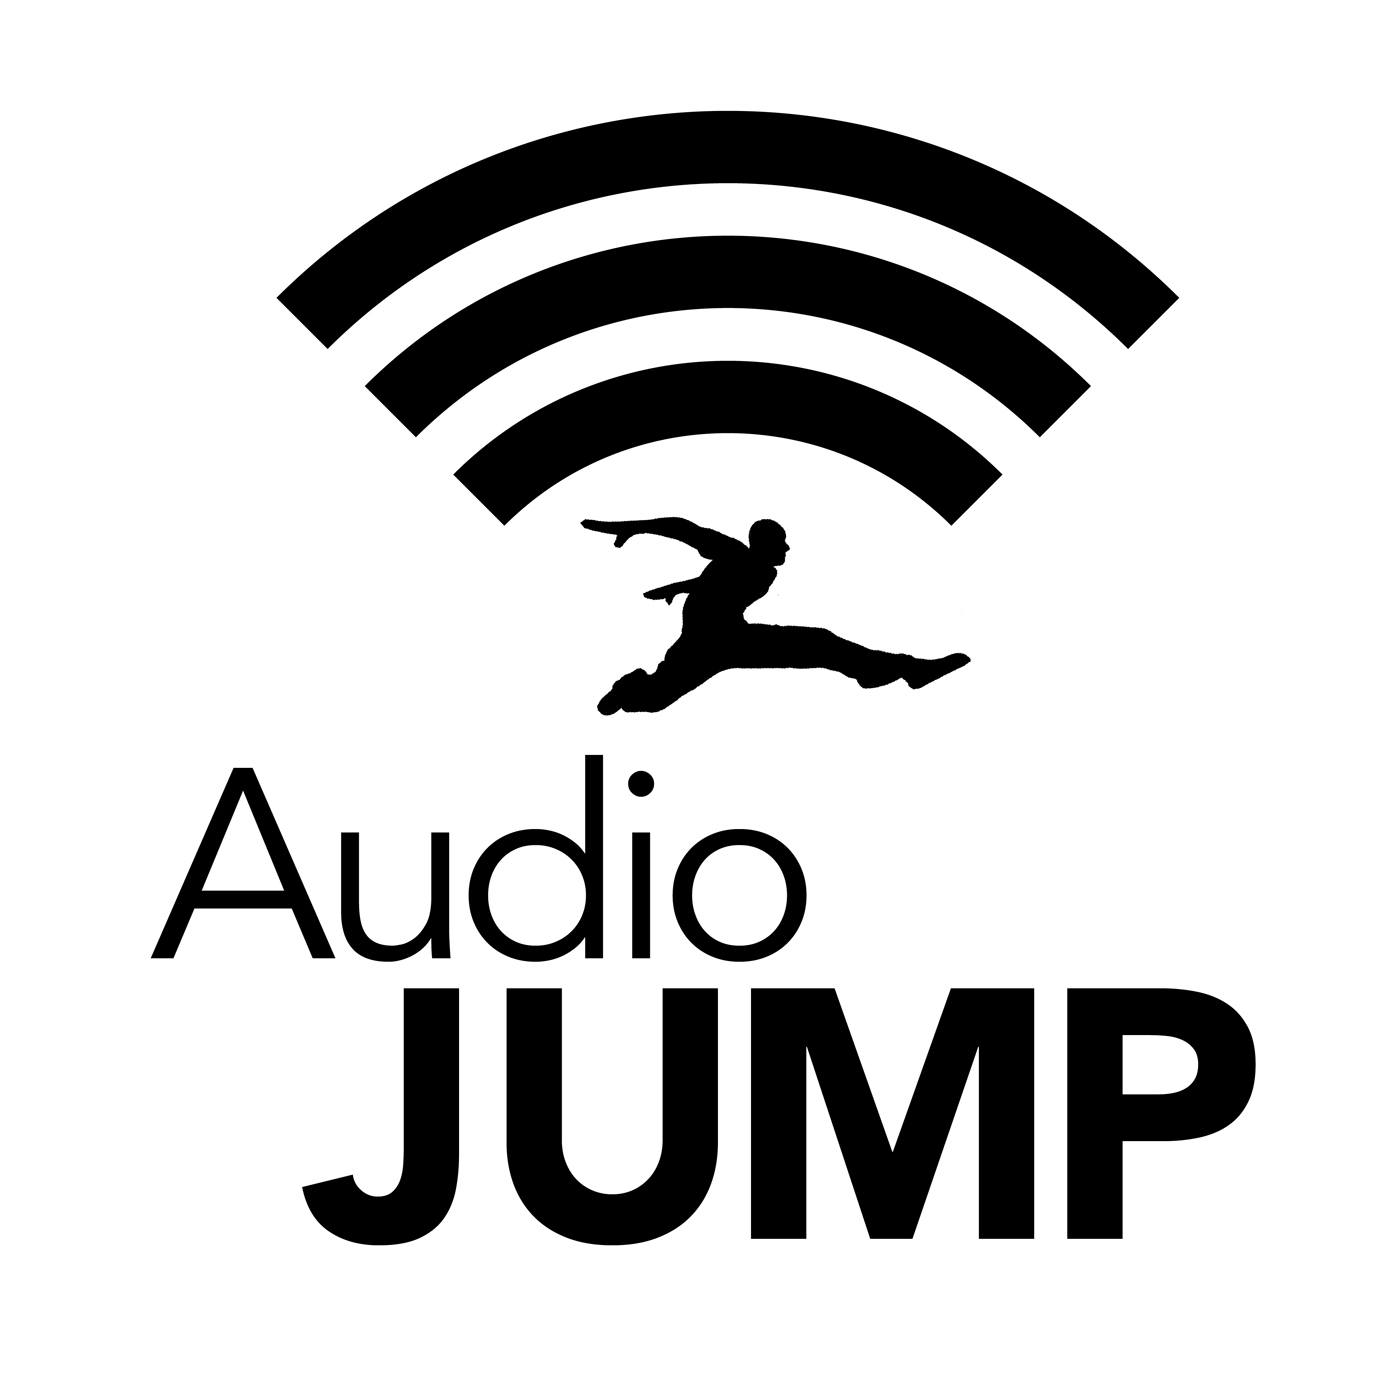 AudioJUMP - Parkour People Podcast